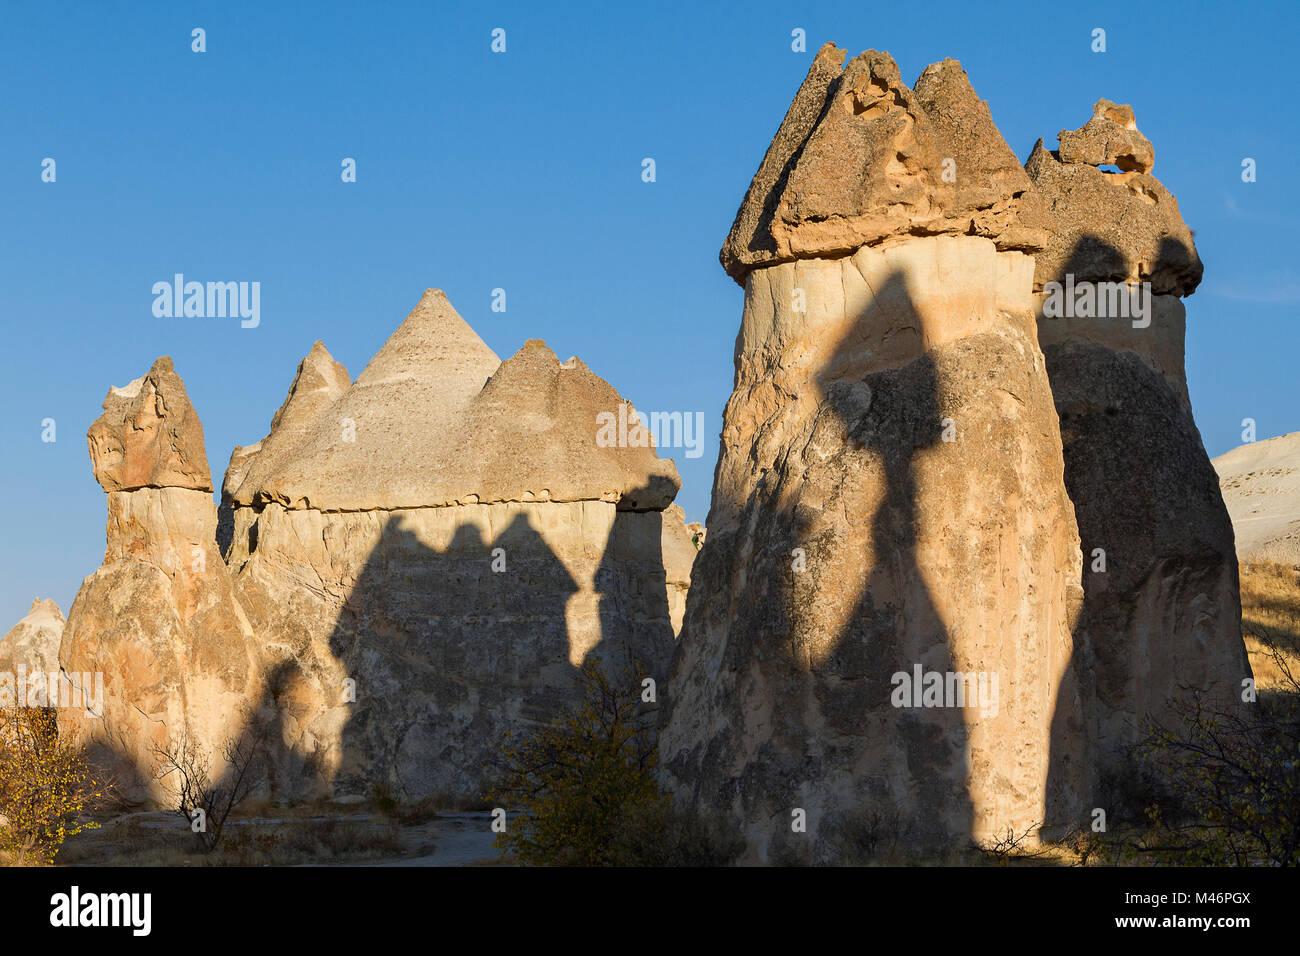 Cheminees De Fees En Cappadoce Turquie Banque D Images Photo Stock